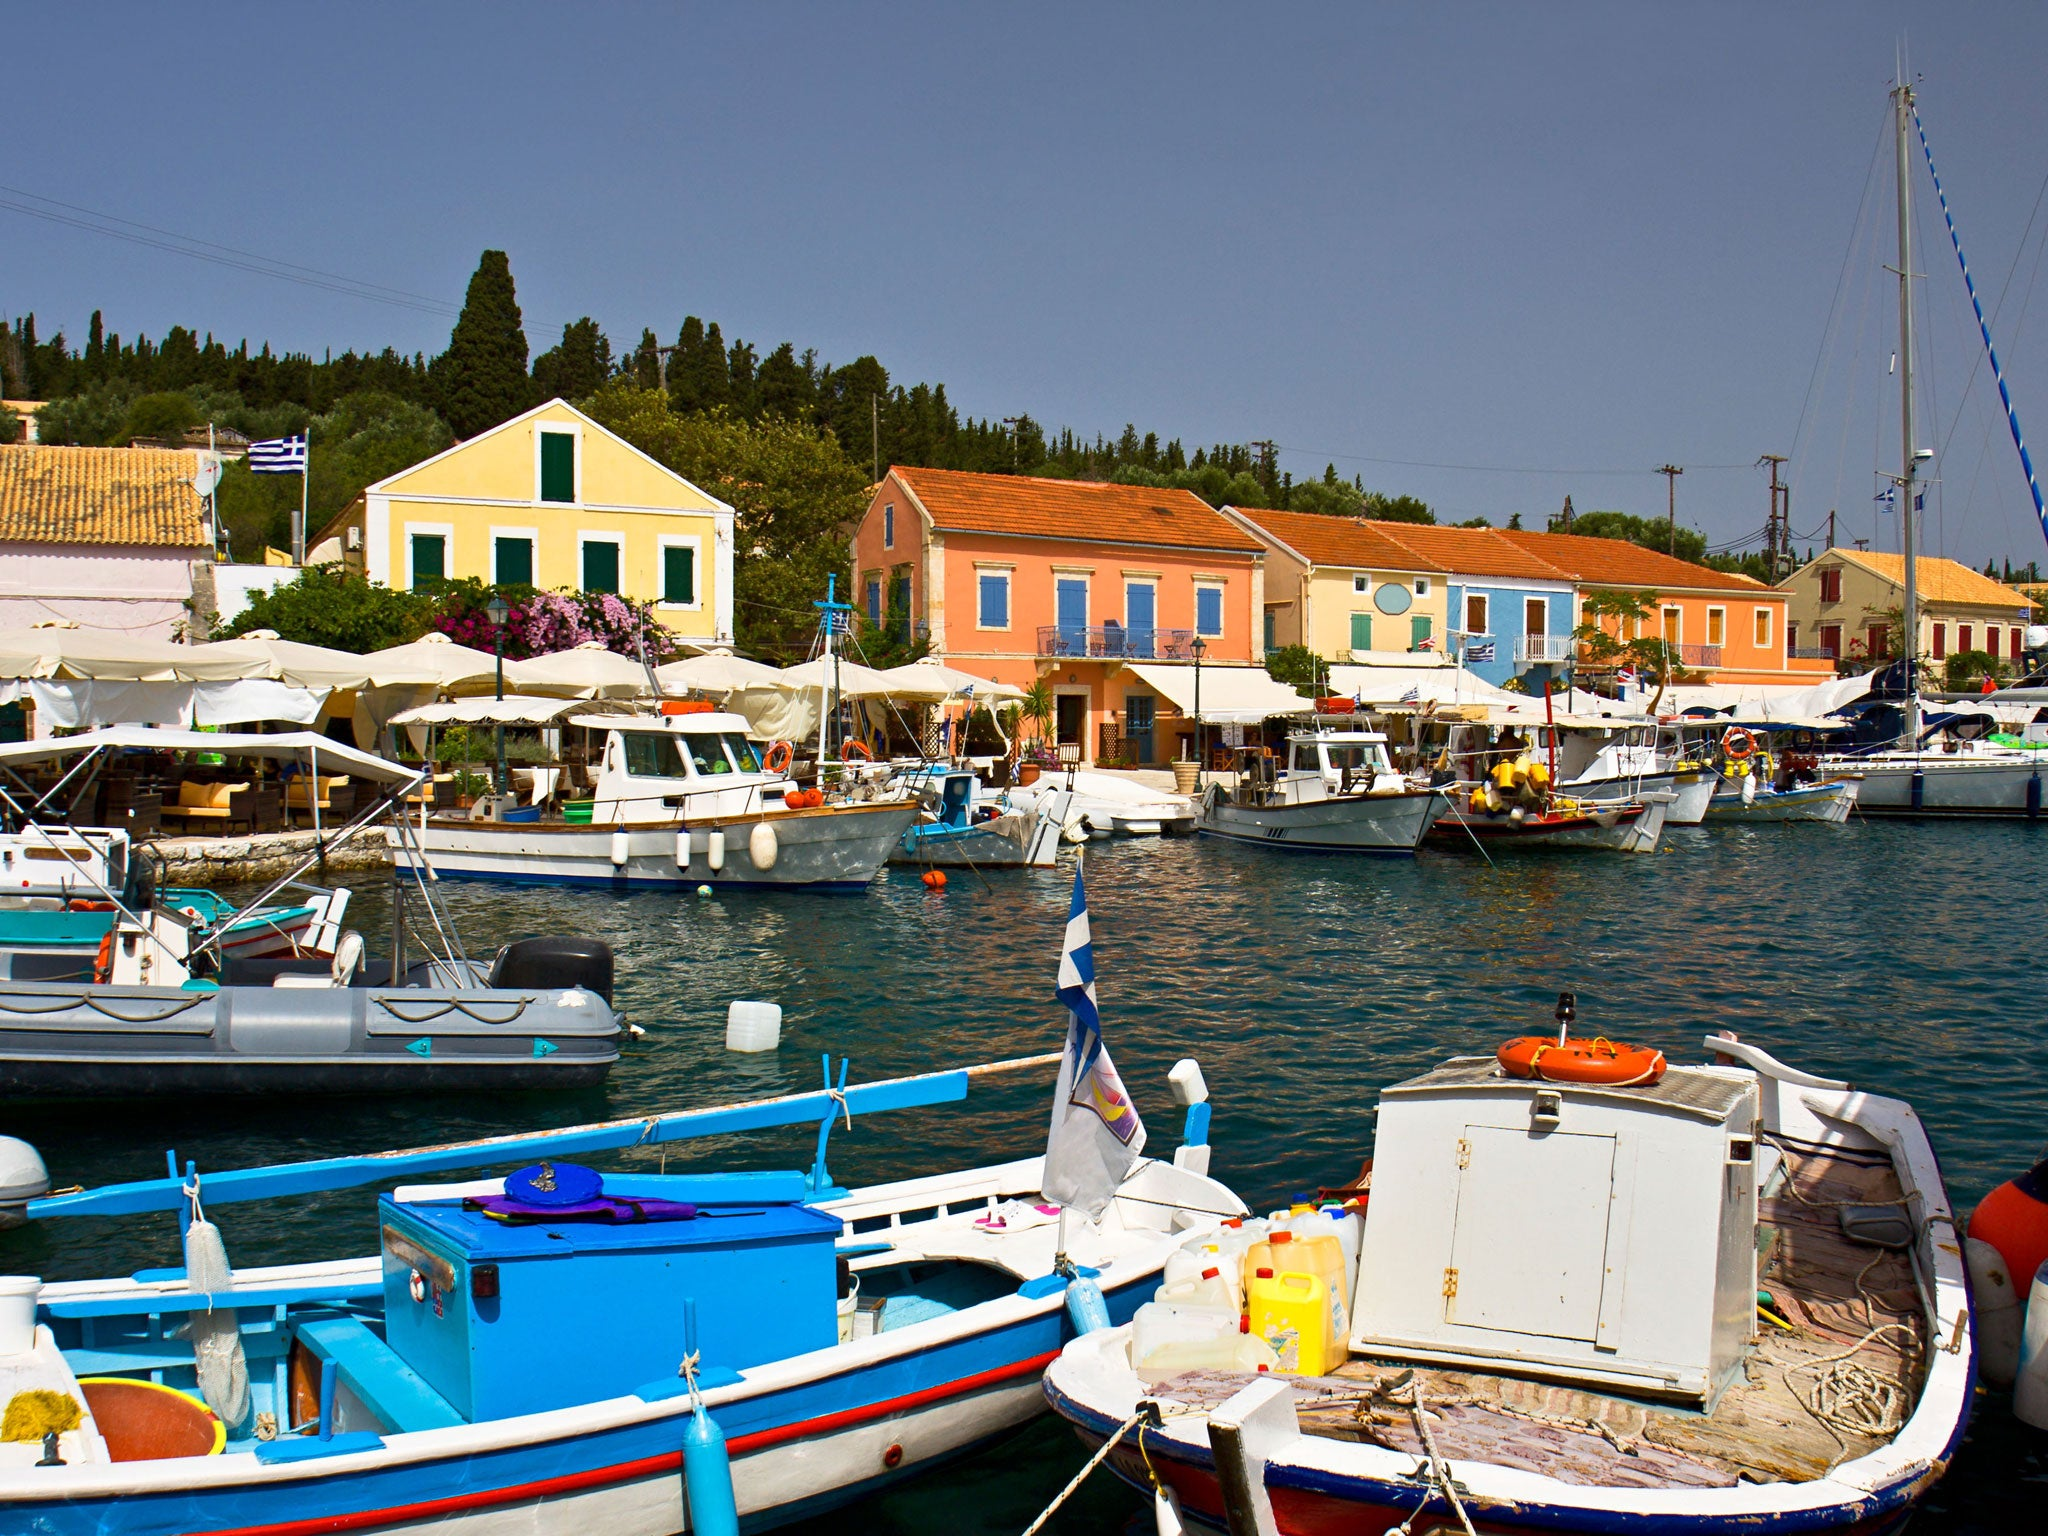 Greece: Homage to Kefalonian cuisine